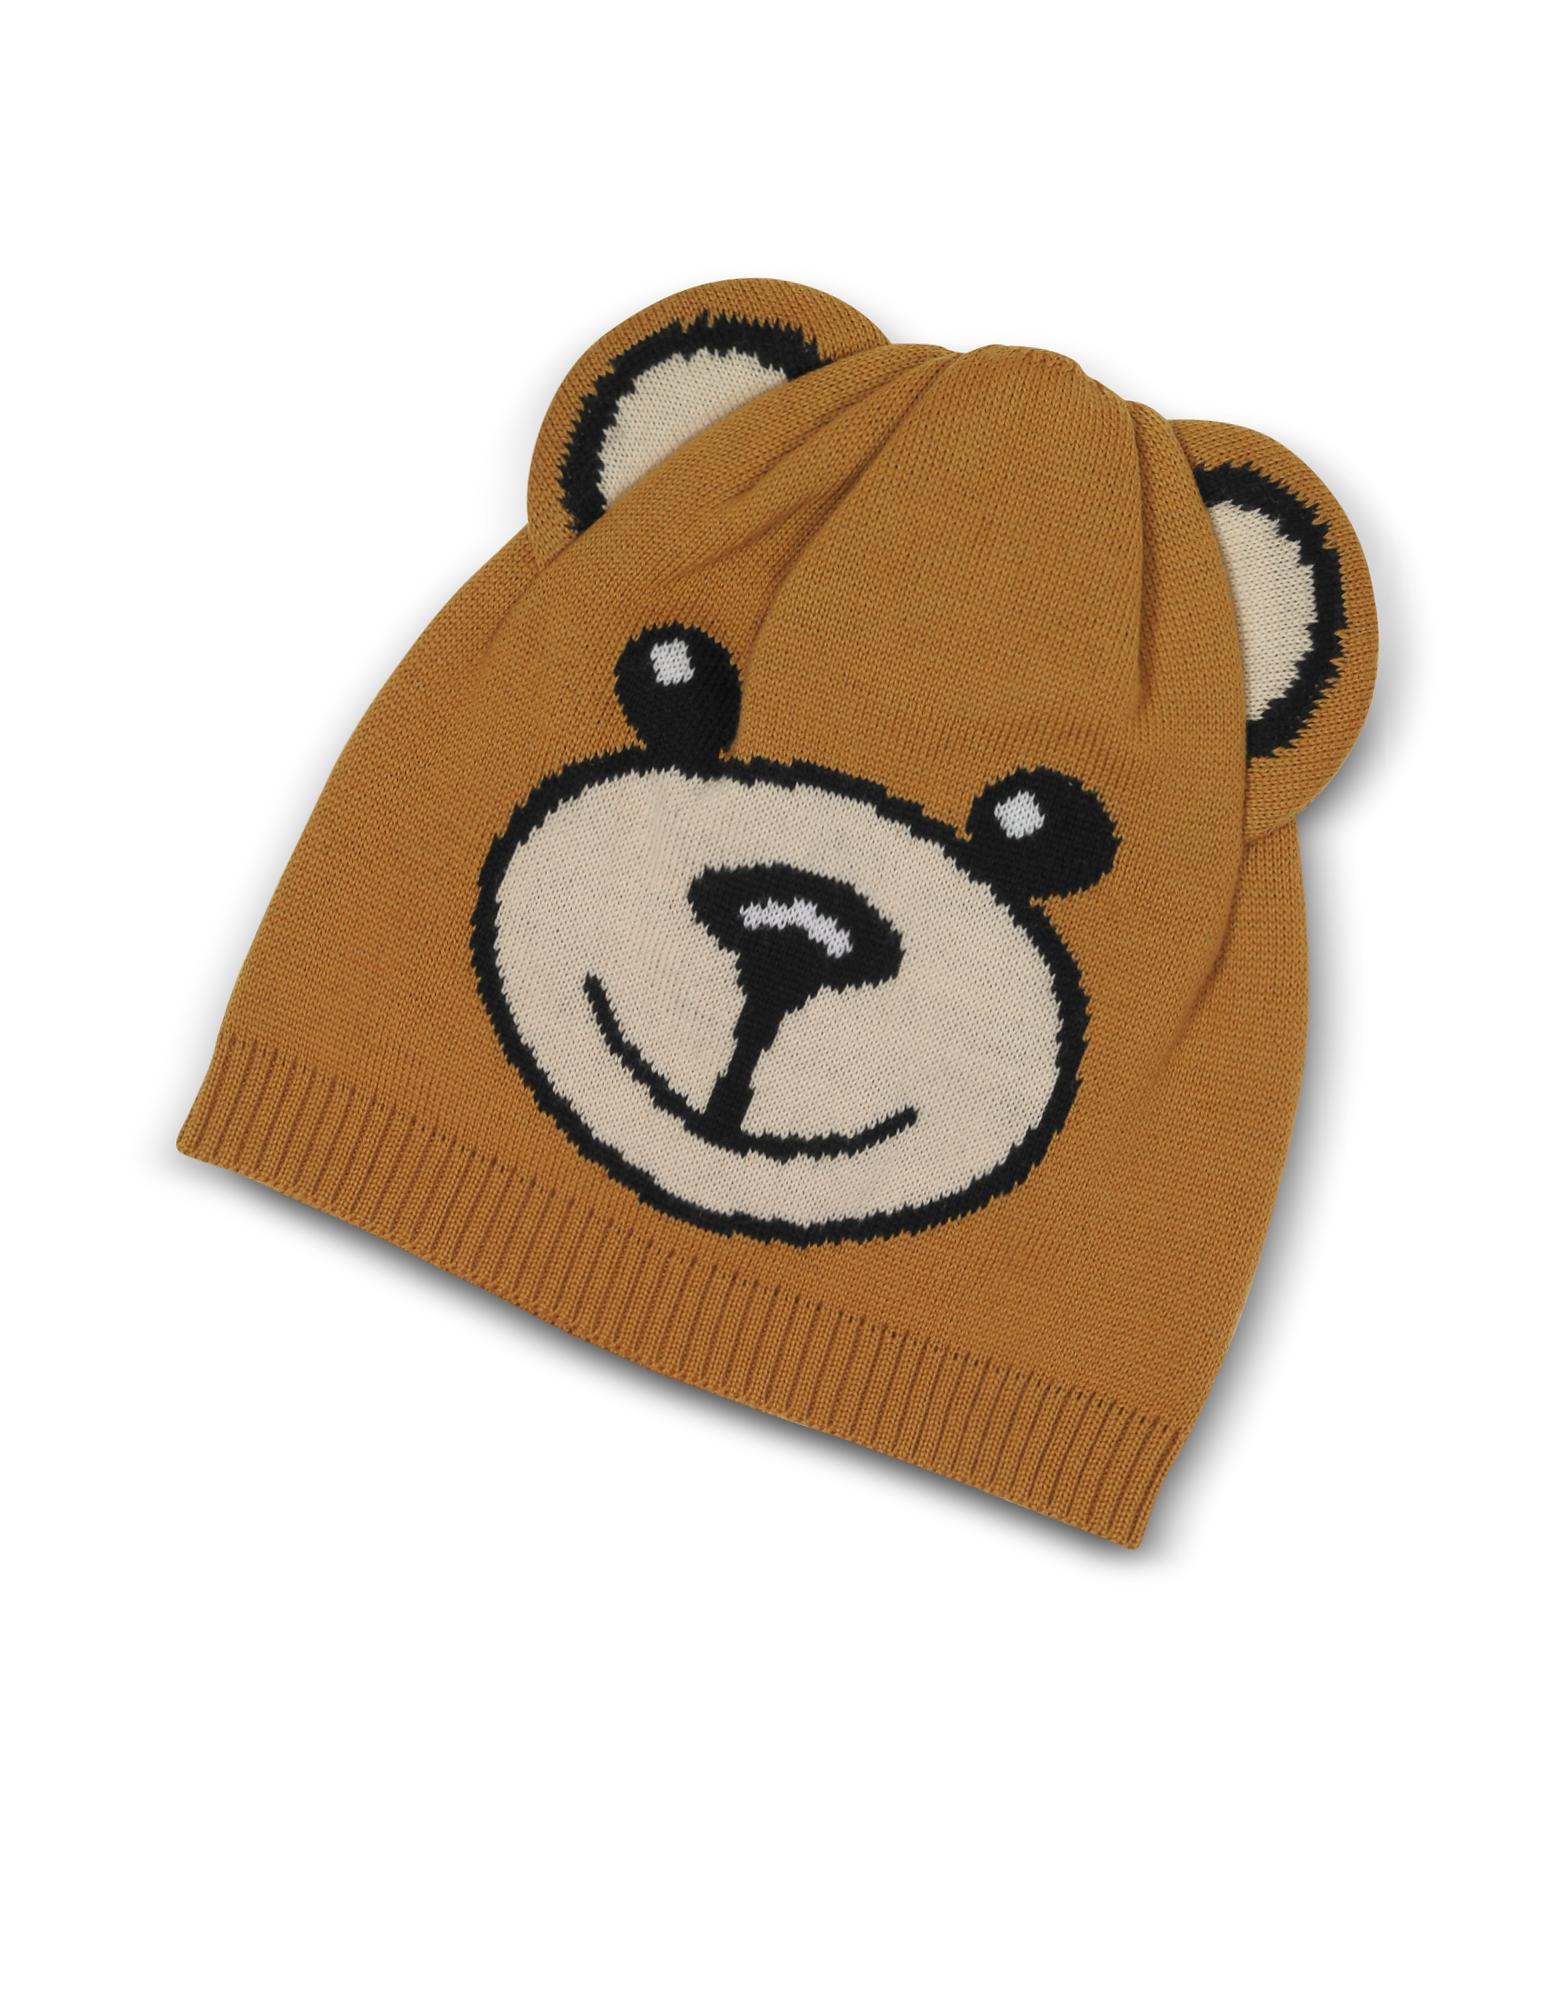 MOSCHINO TEDDY BEAR BROWN WOOL BEANIE